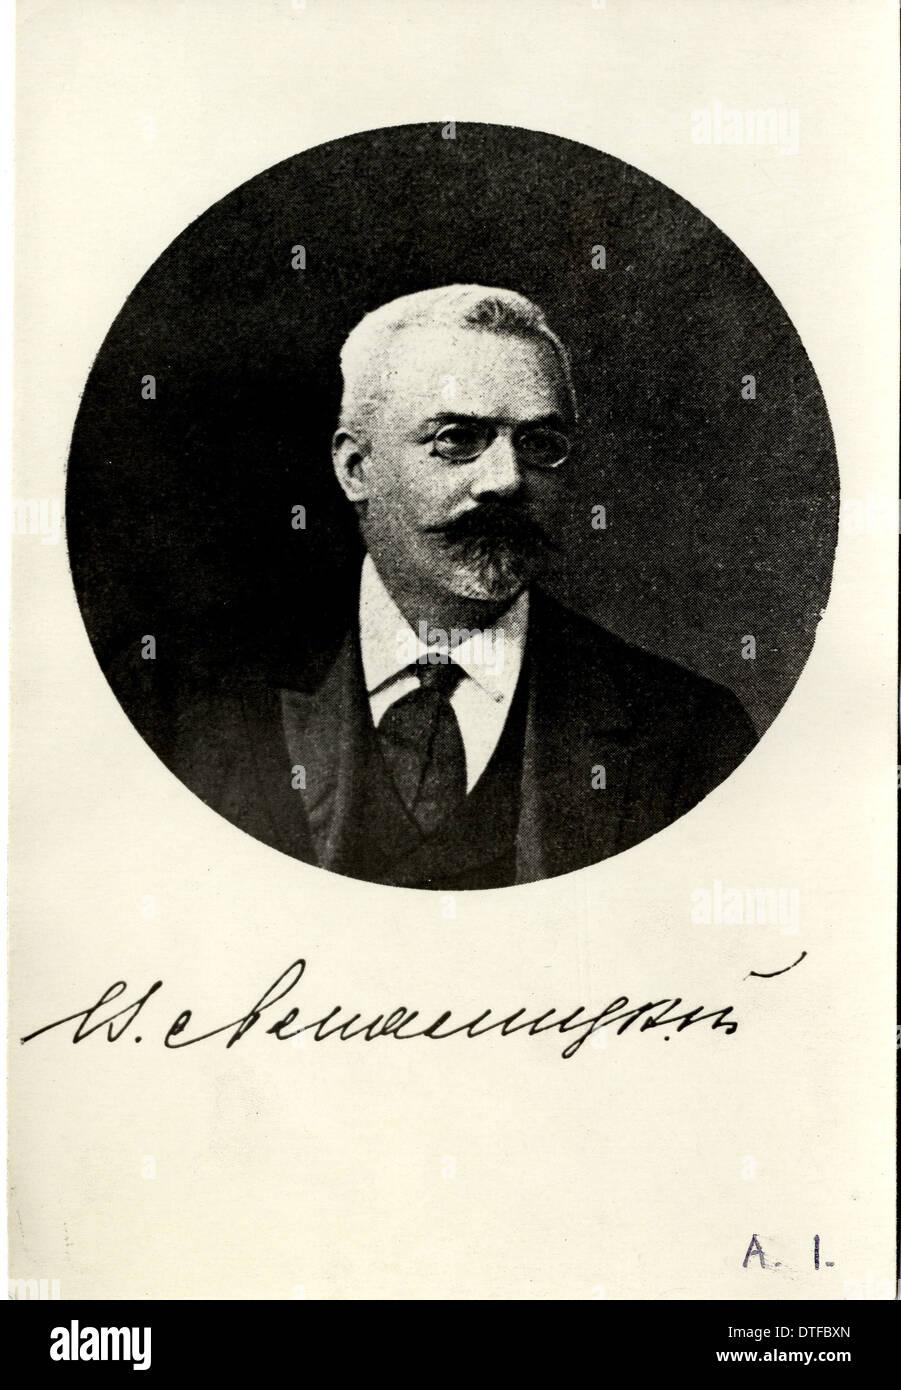 Vladimir Prokhorovich Amalitzkii (1860-1917) - Stock Image